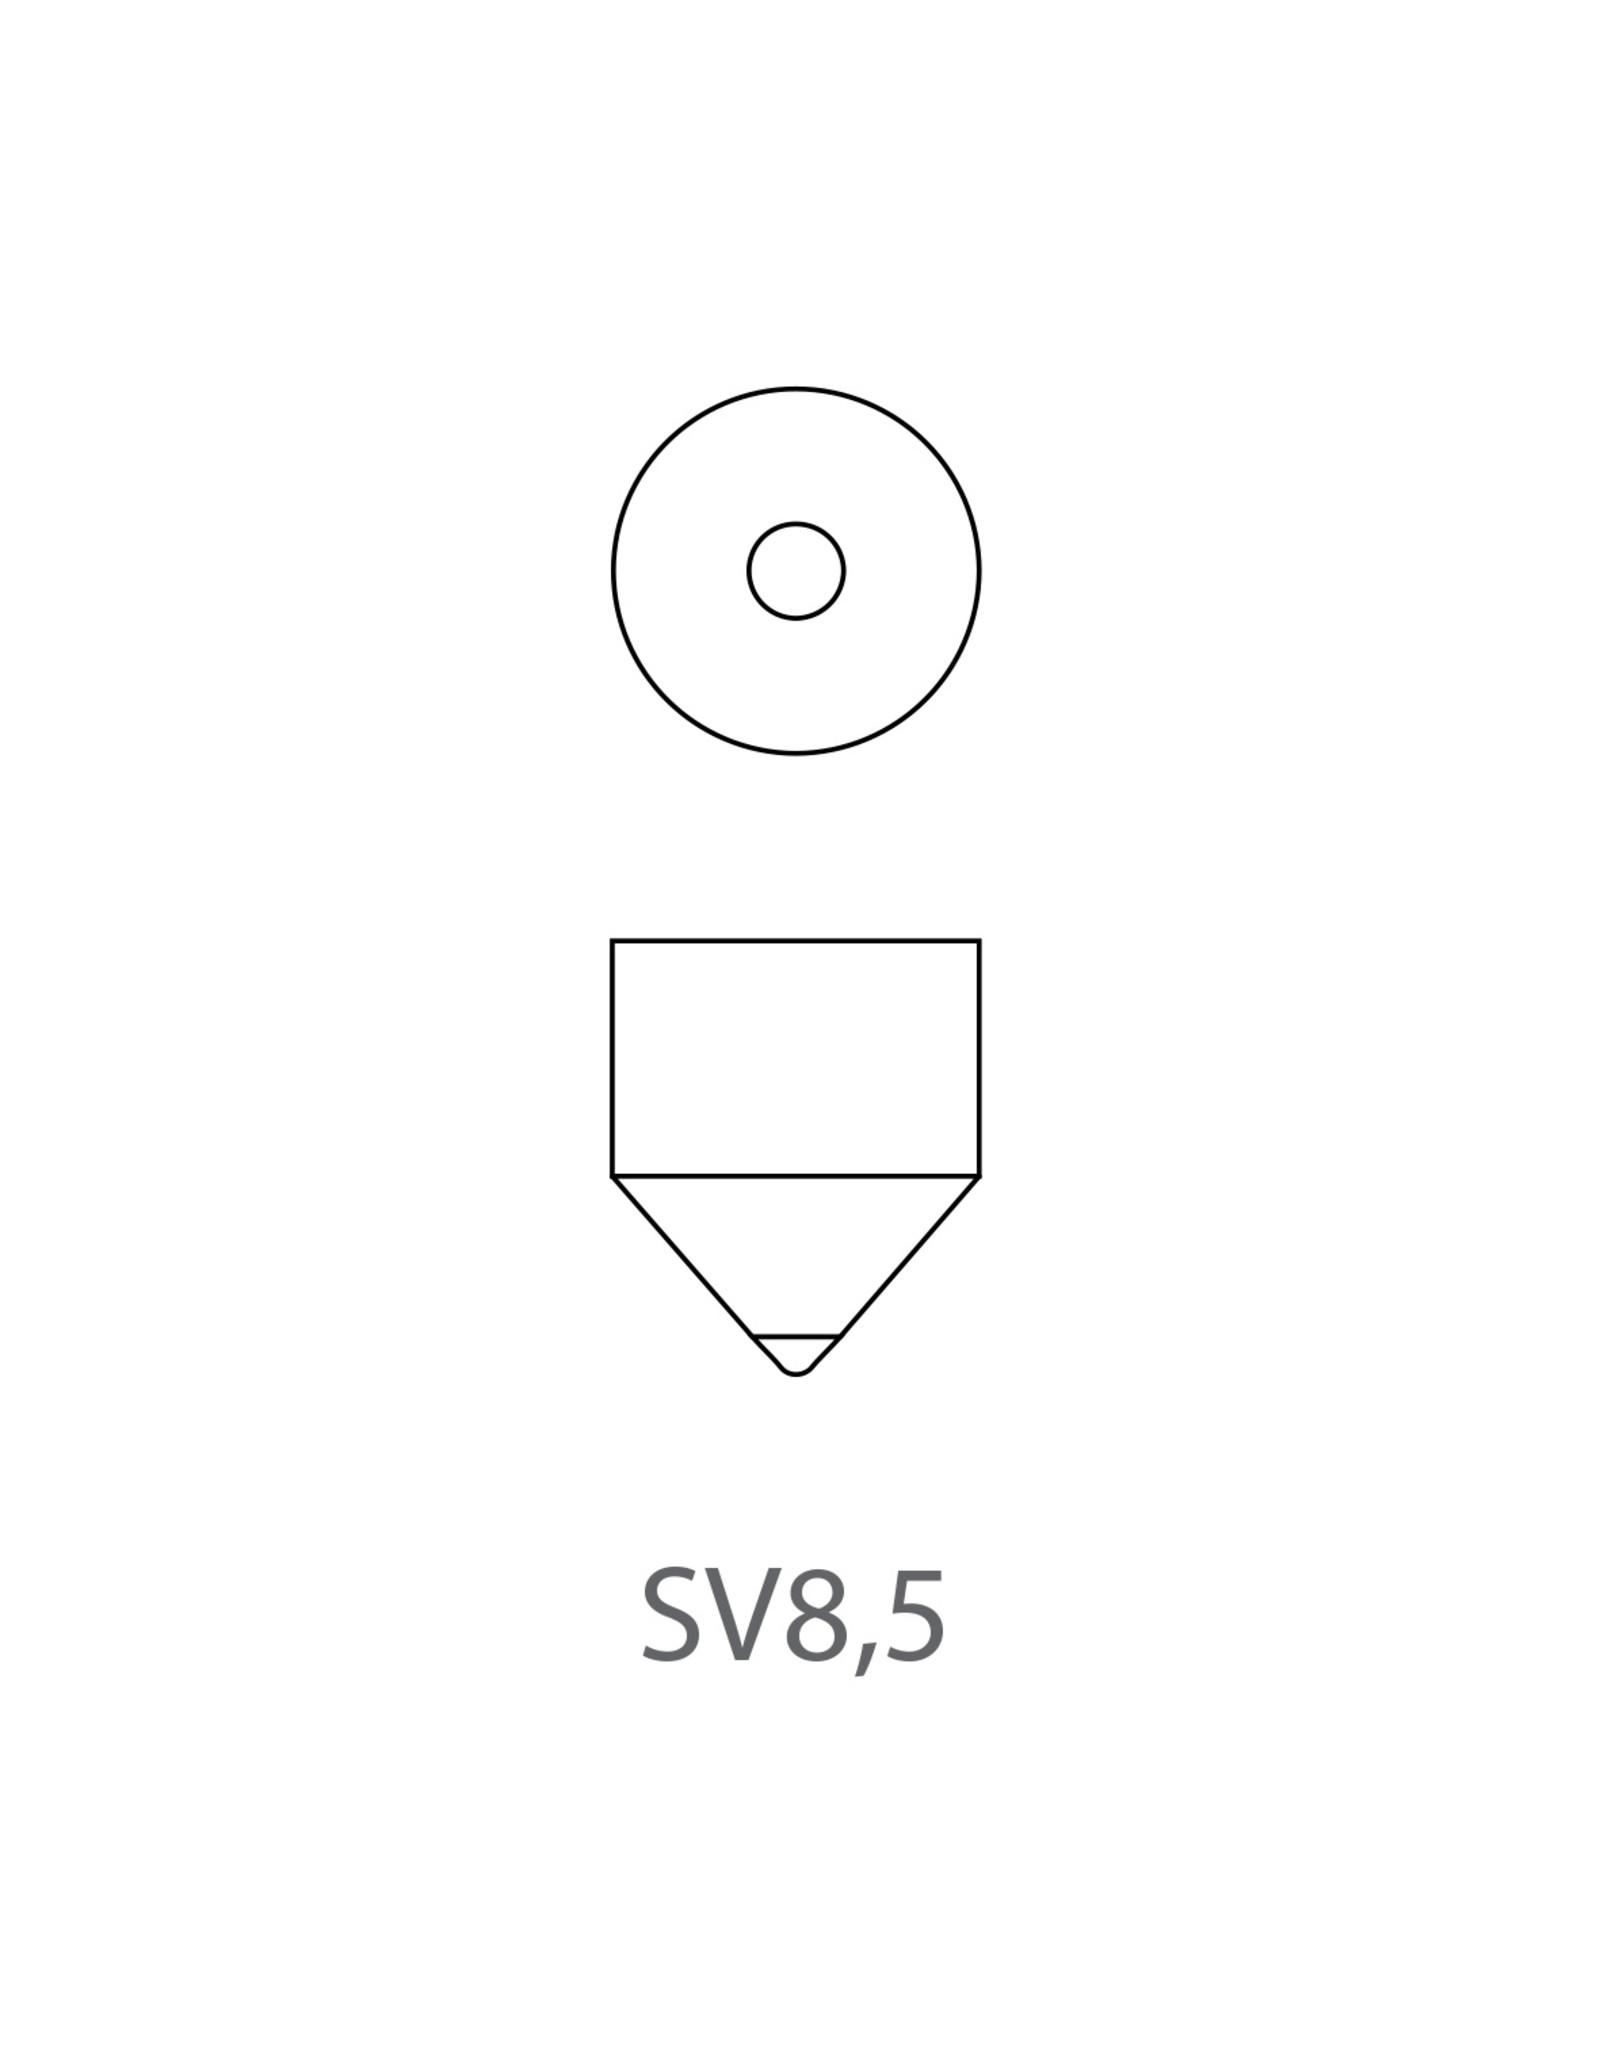 Autolamp 12V 15W SV8,5 15,5x43 2x